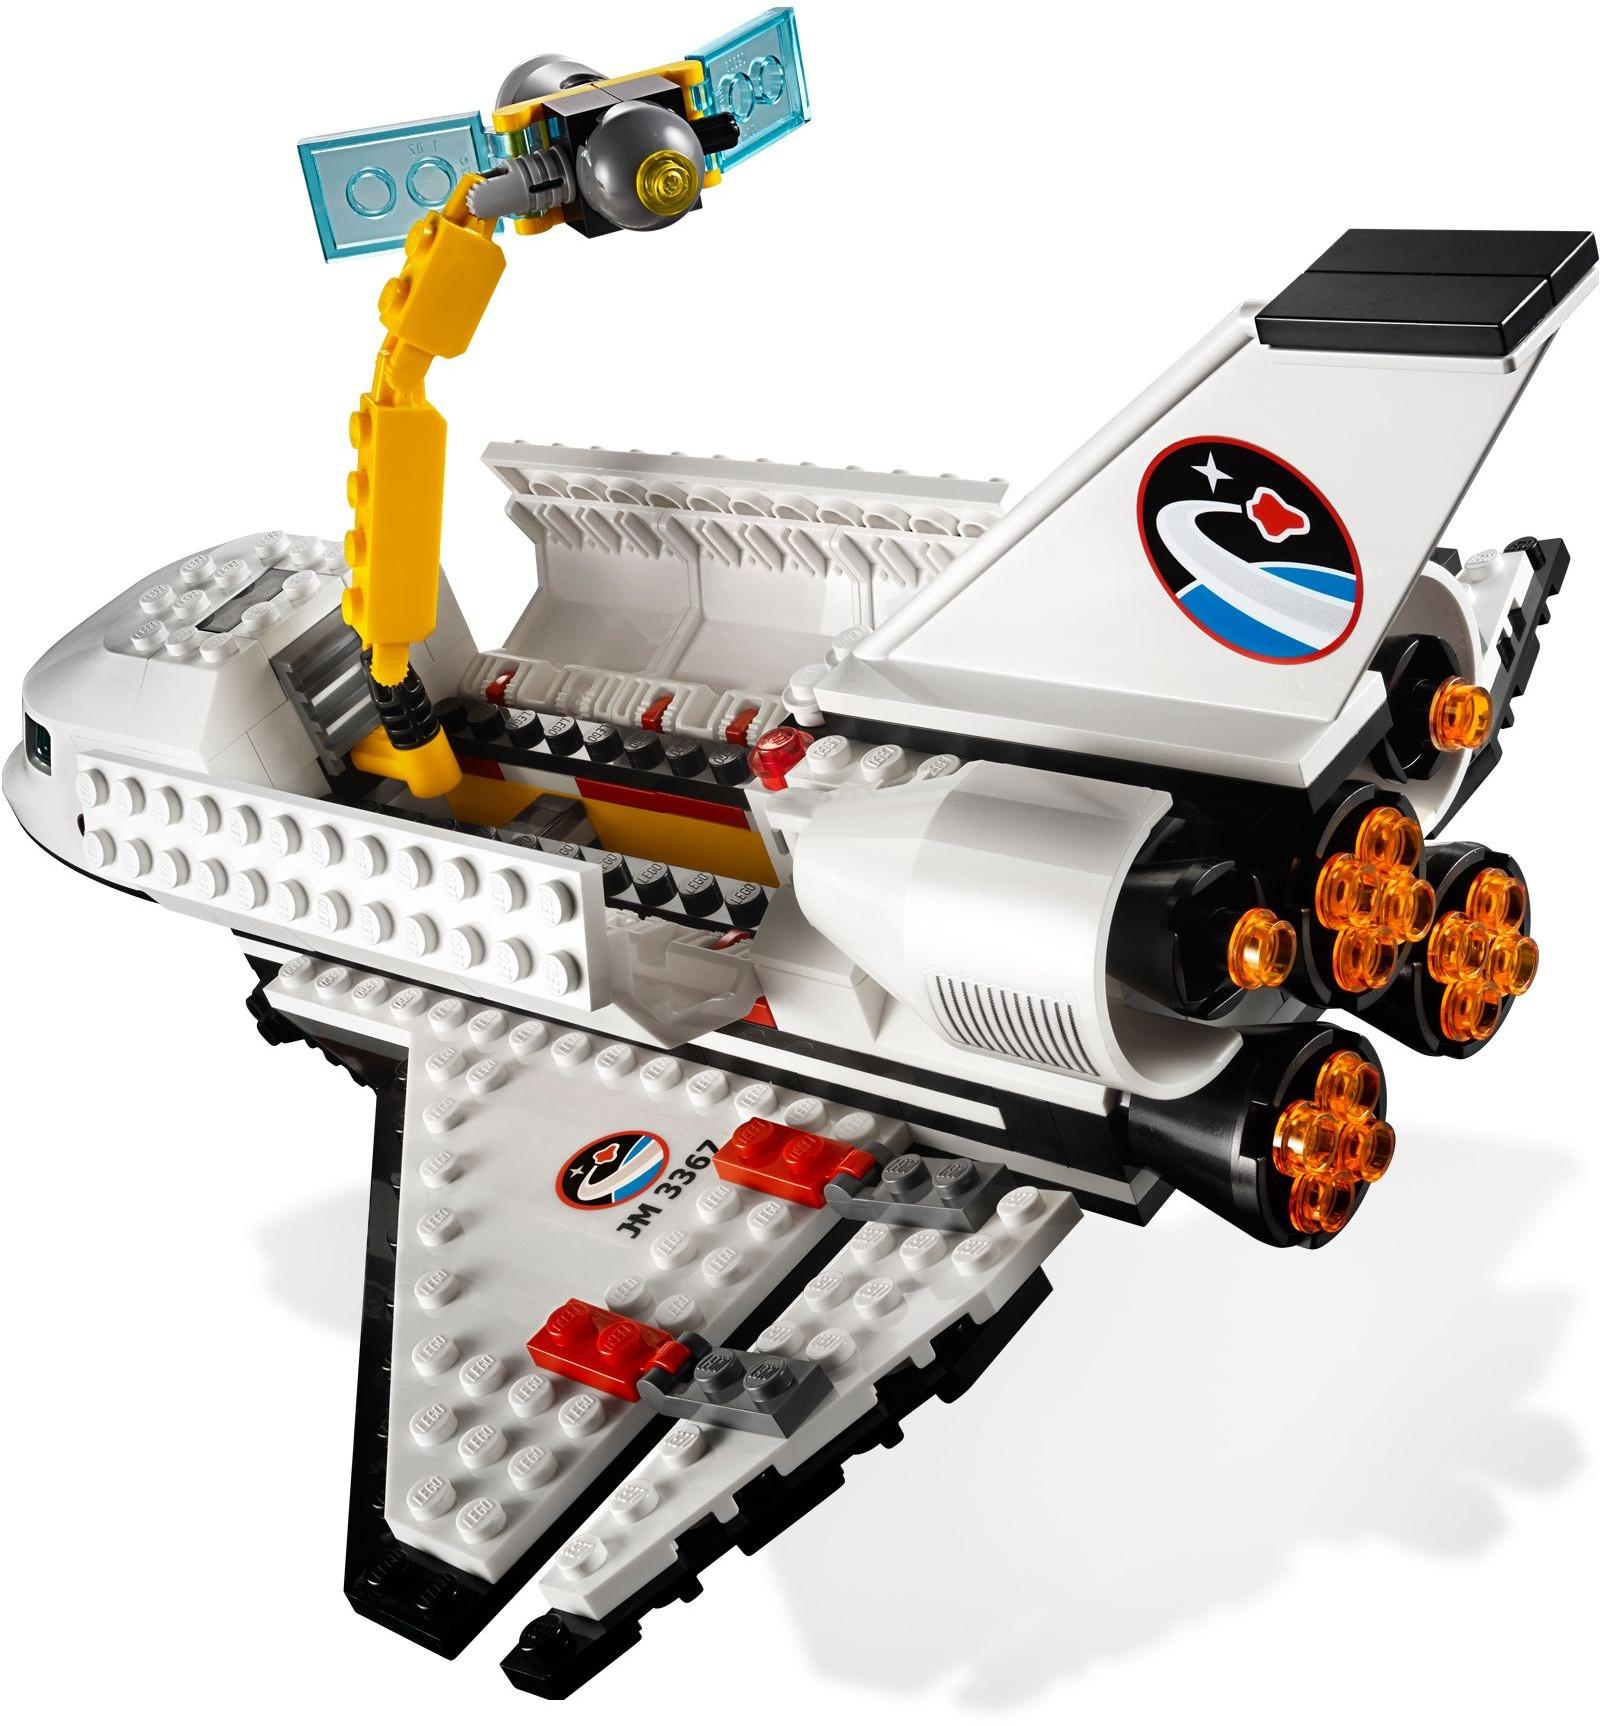 lego space shuttle orbiter - photo #23